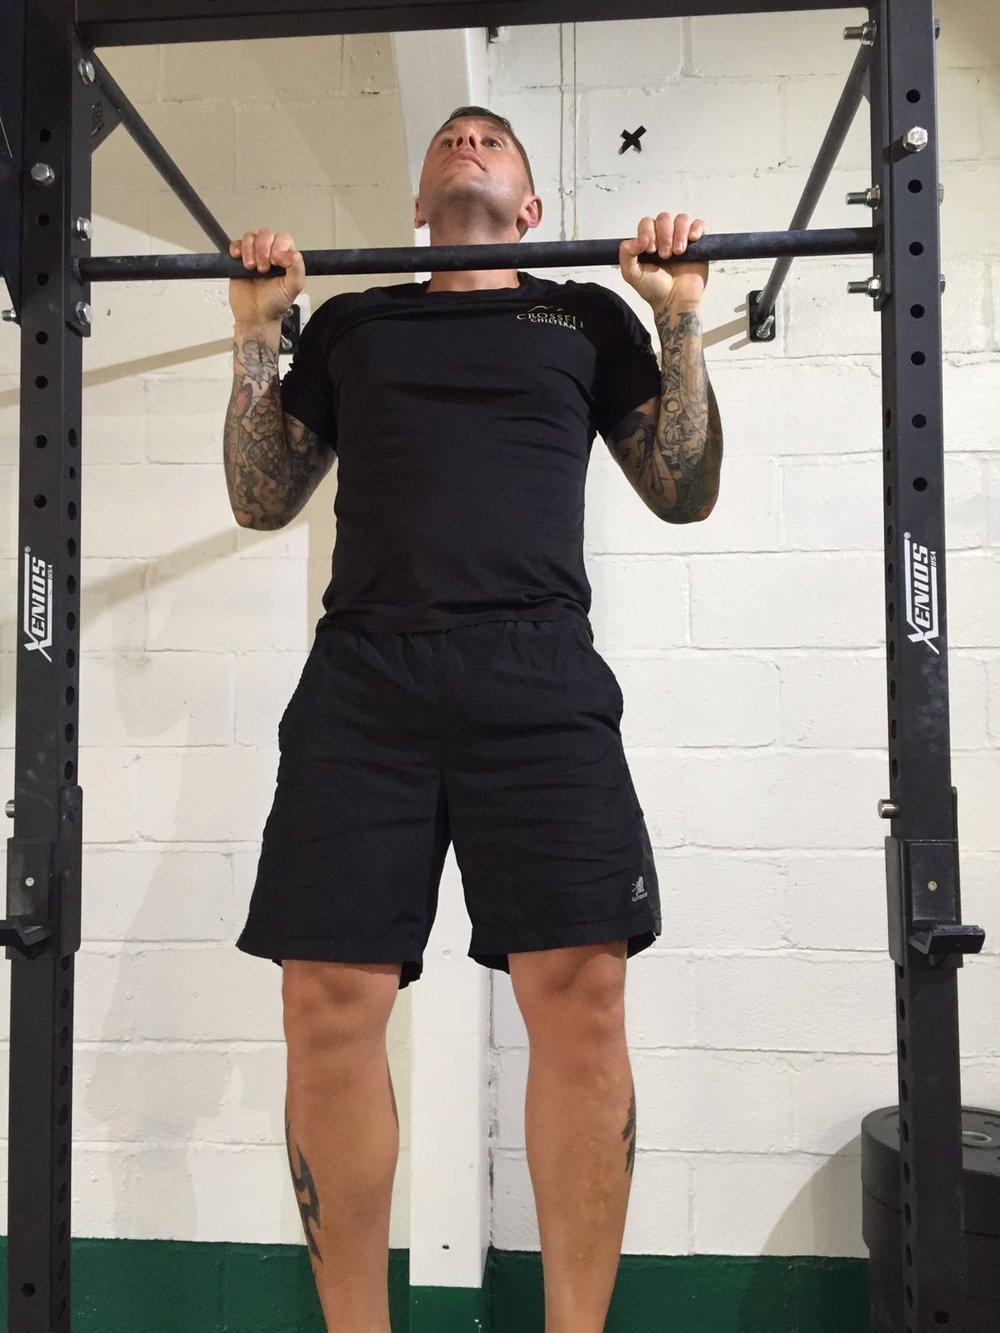 Pull ups, strength exercises, personal training, crossfit, Amersham, chilterns